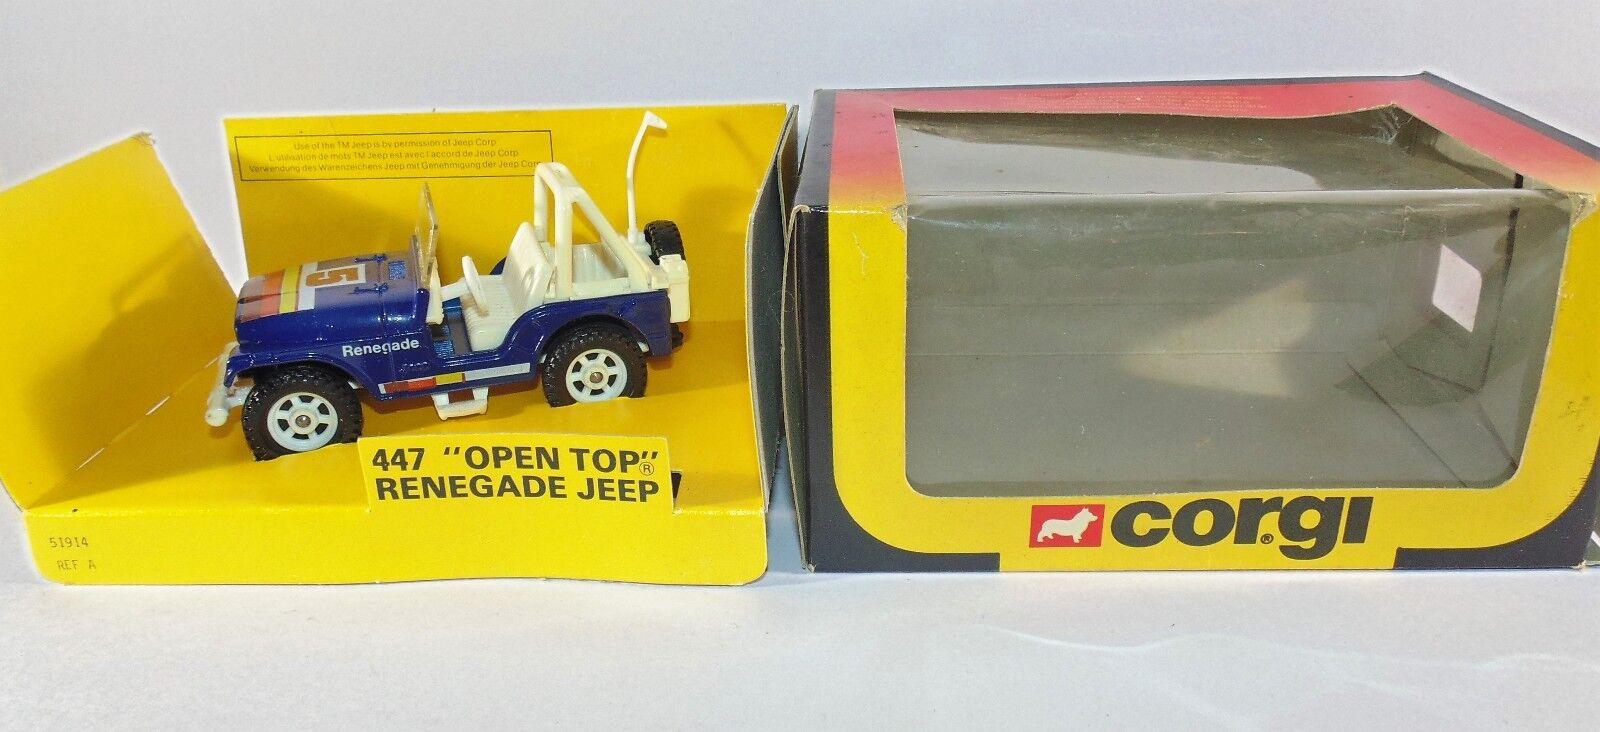 Diecast Corgi 447 Open Top Renegade Jeep Boxed